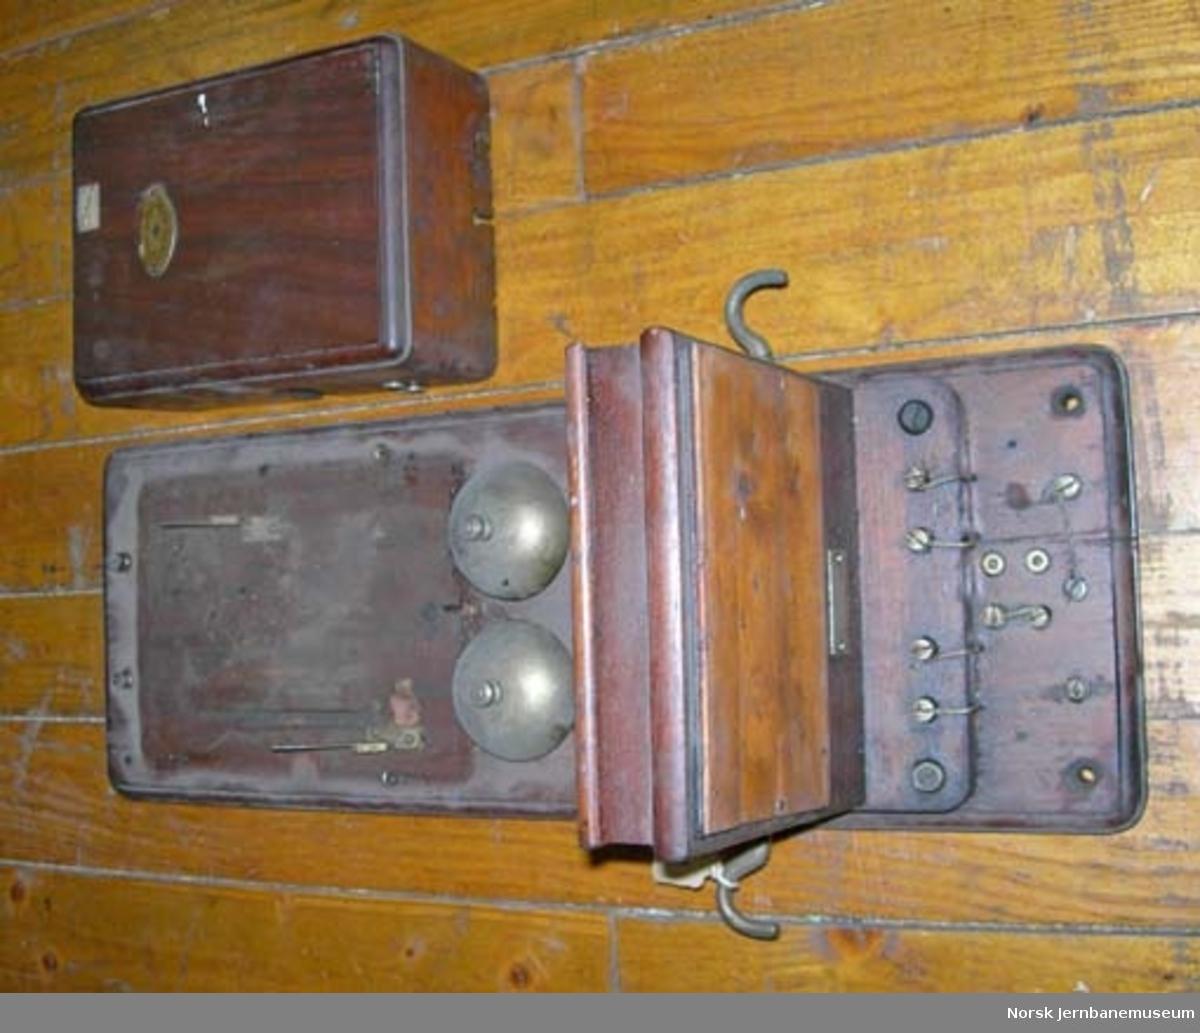 Telefonapparat med fast platemikrofon